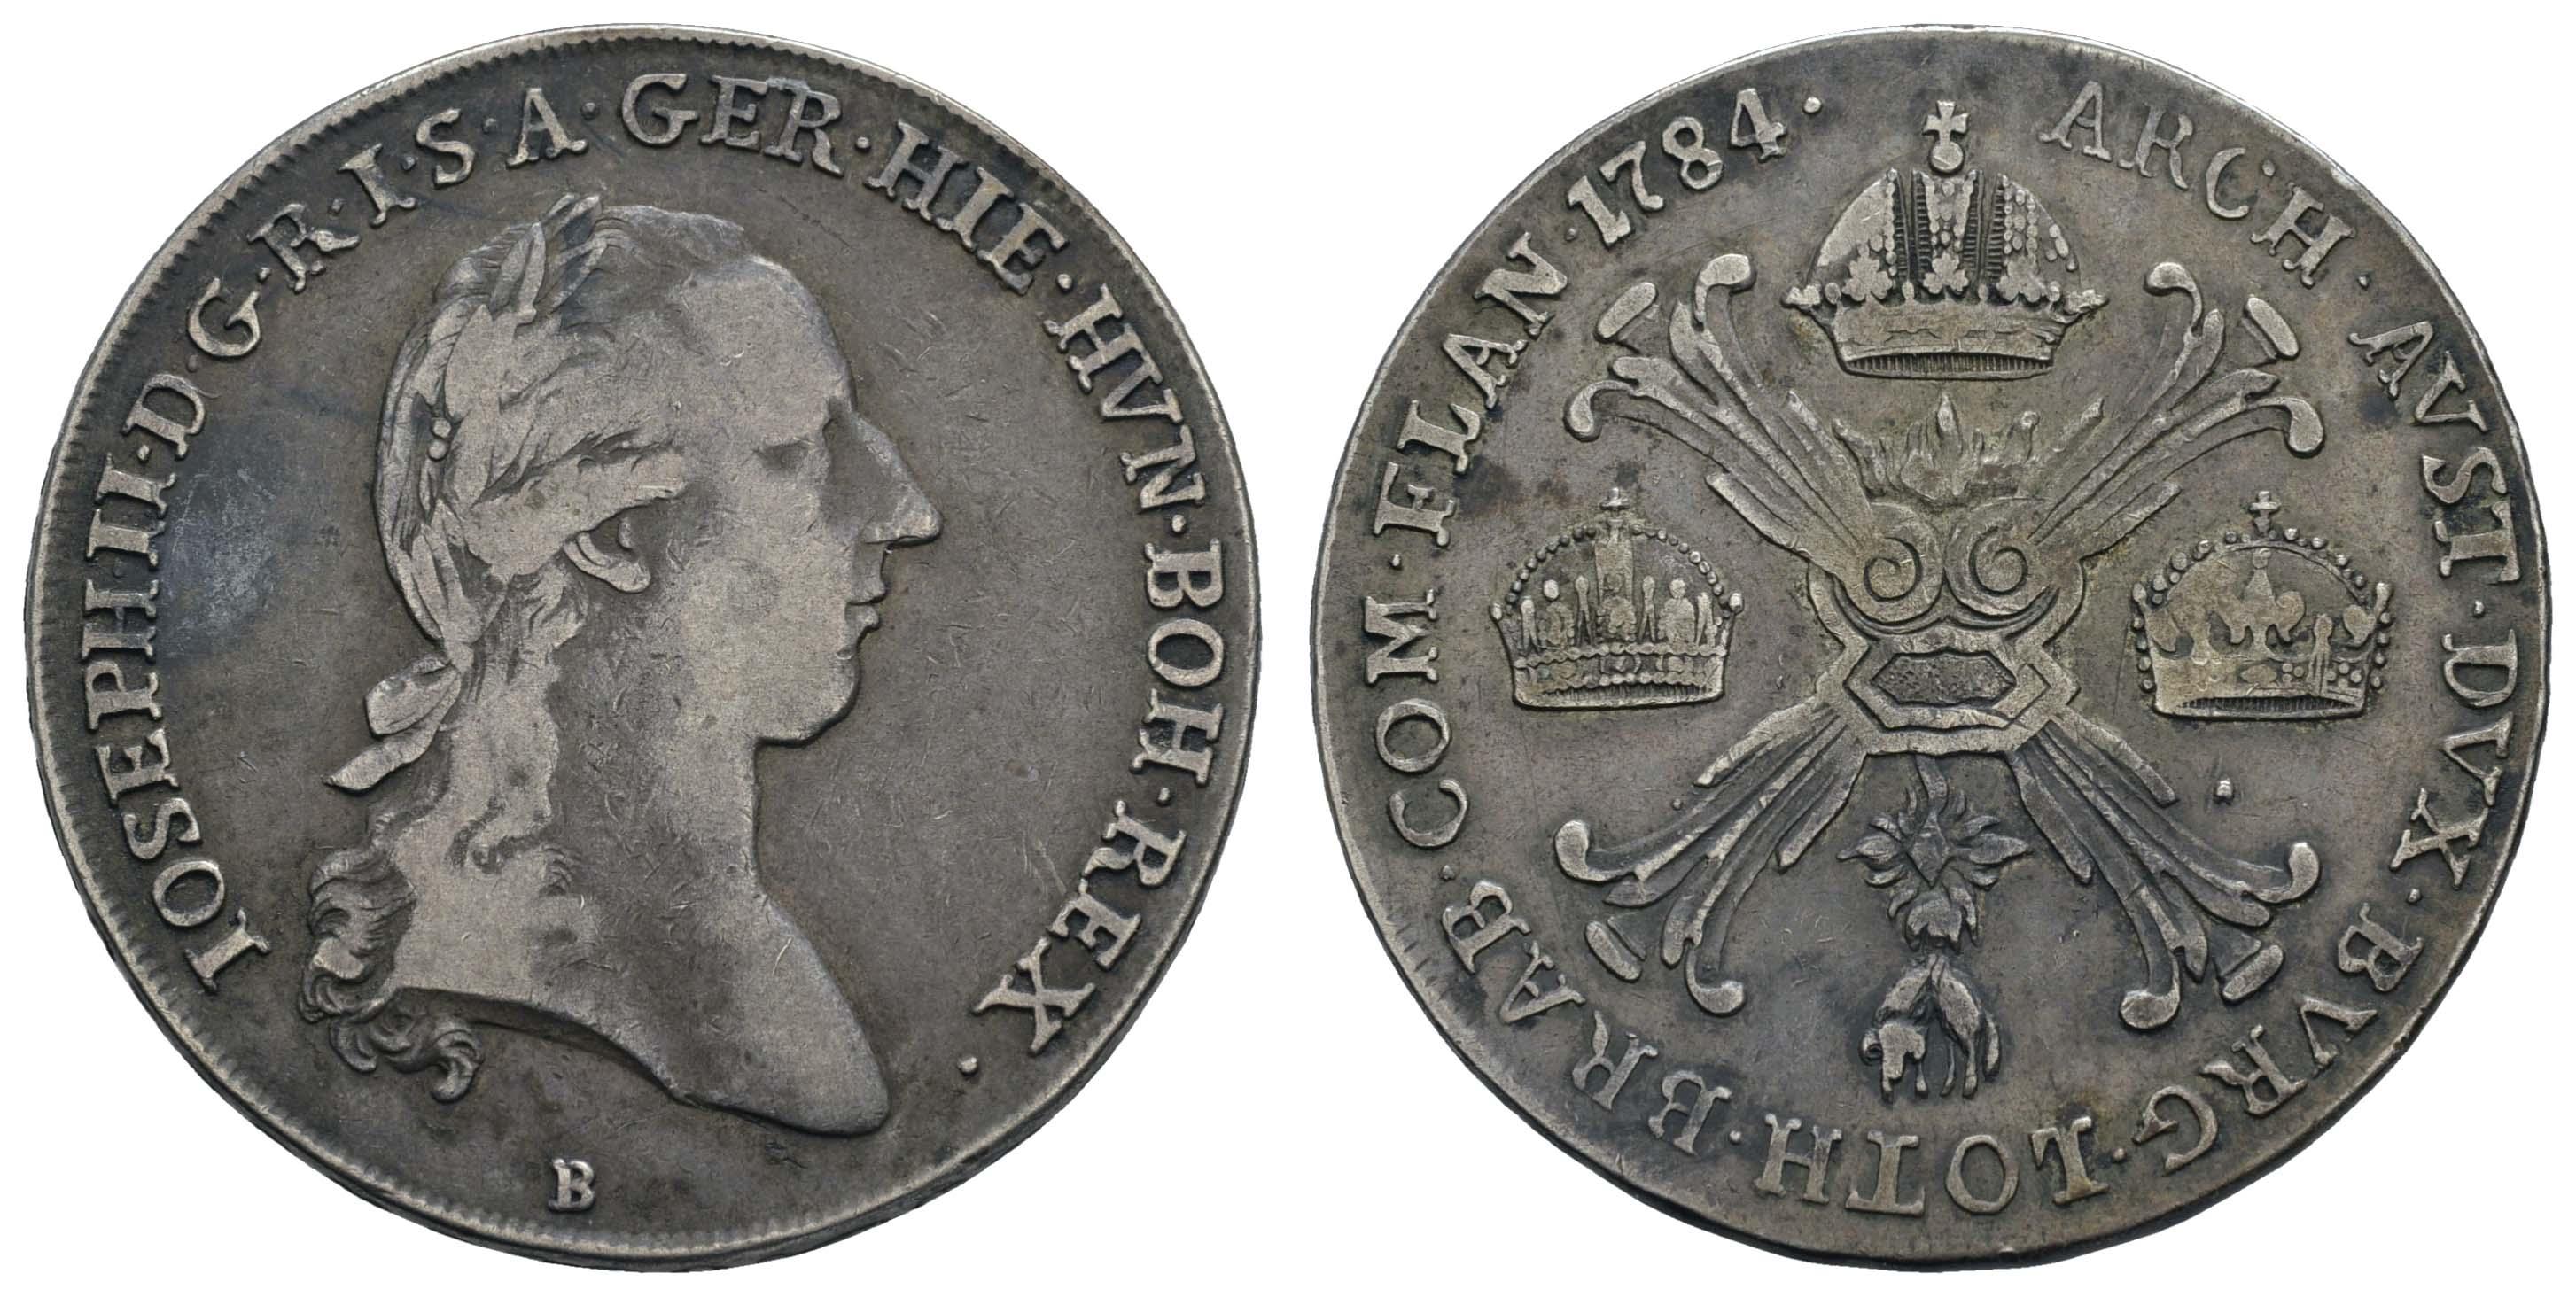 Lot 1360 - europa bis 1799 - Habsburg -  Auktionshaus Ulrich Felzmann GmbH & Co. KG Coins single lots